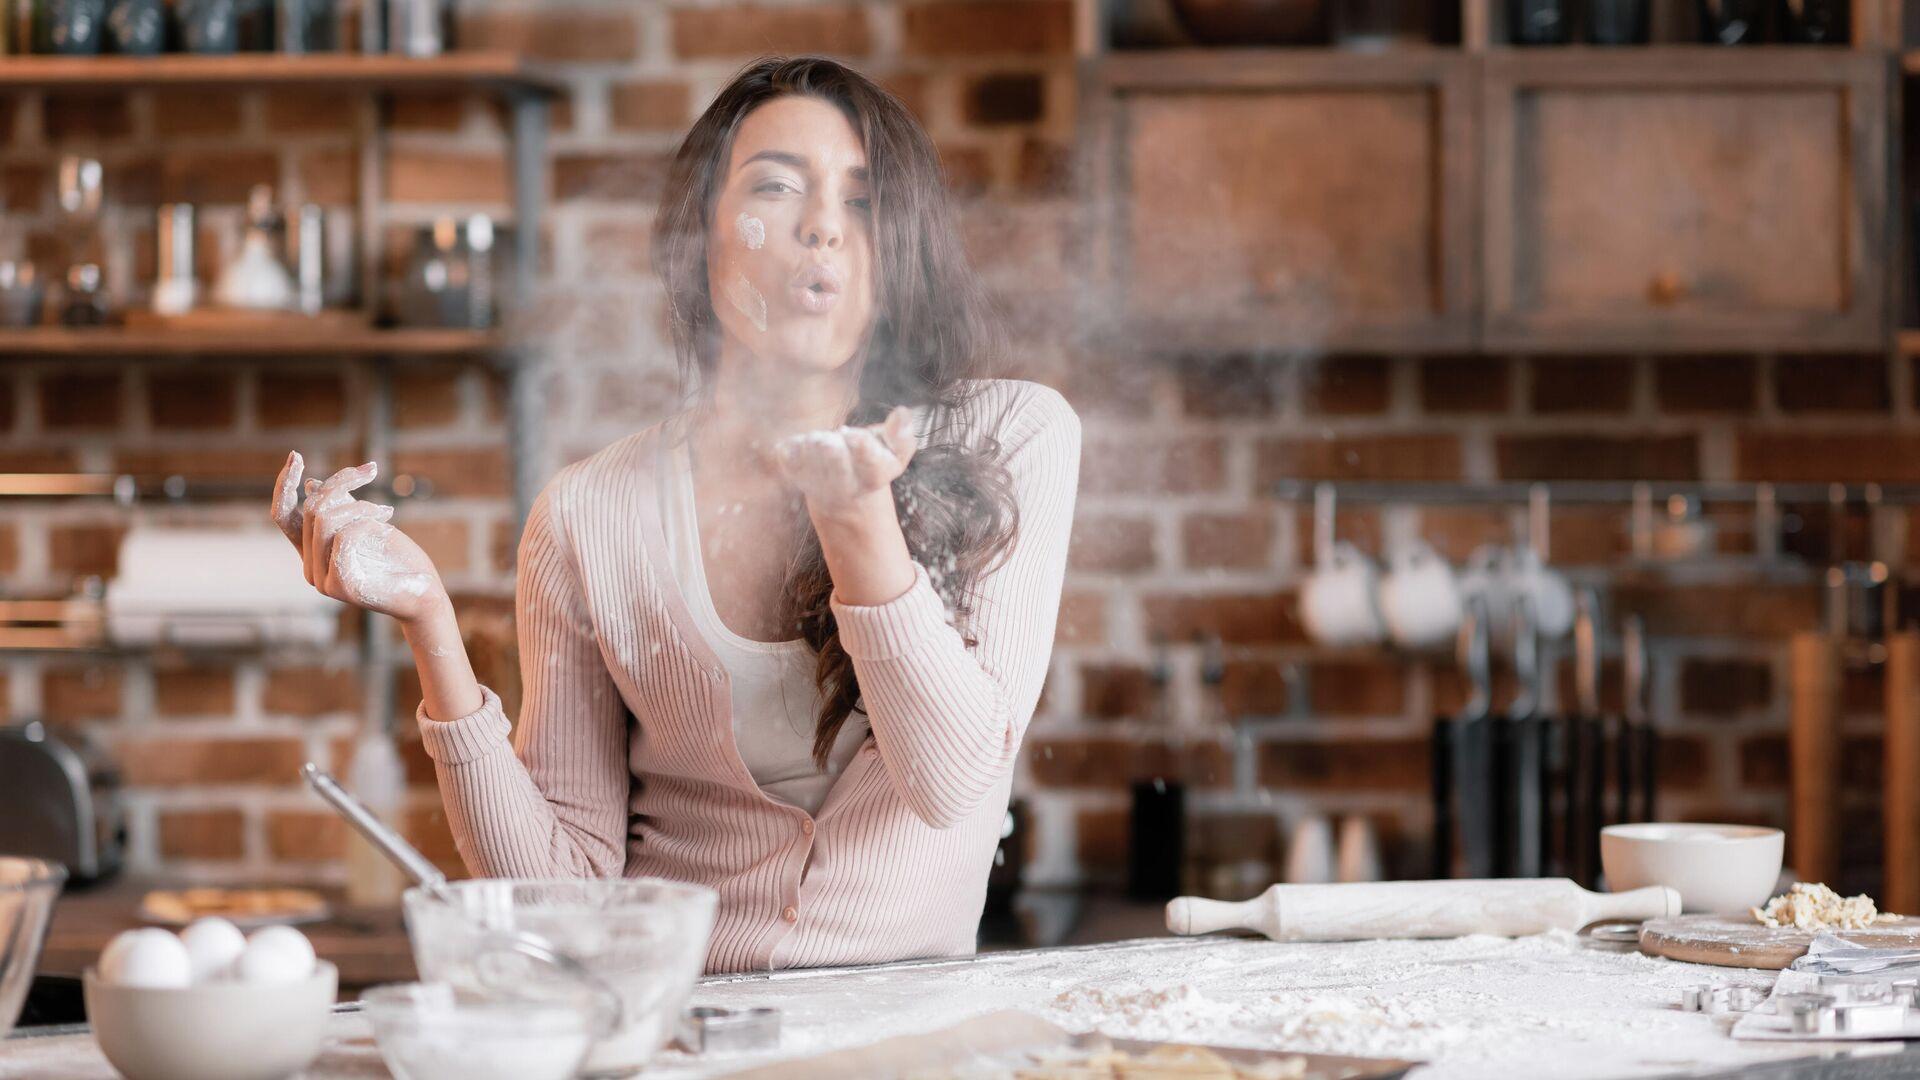 Девушка на кухне  - РИА Новости, 1920, 28.02.2021